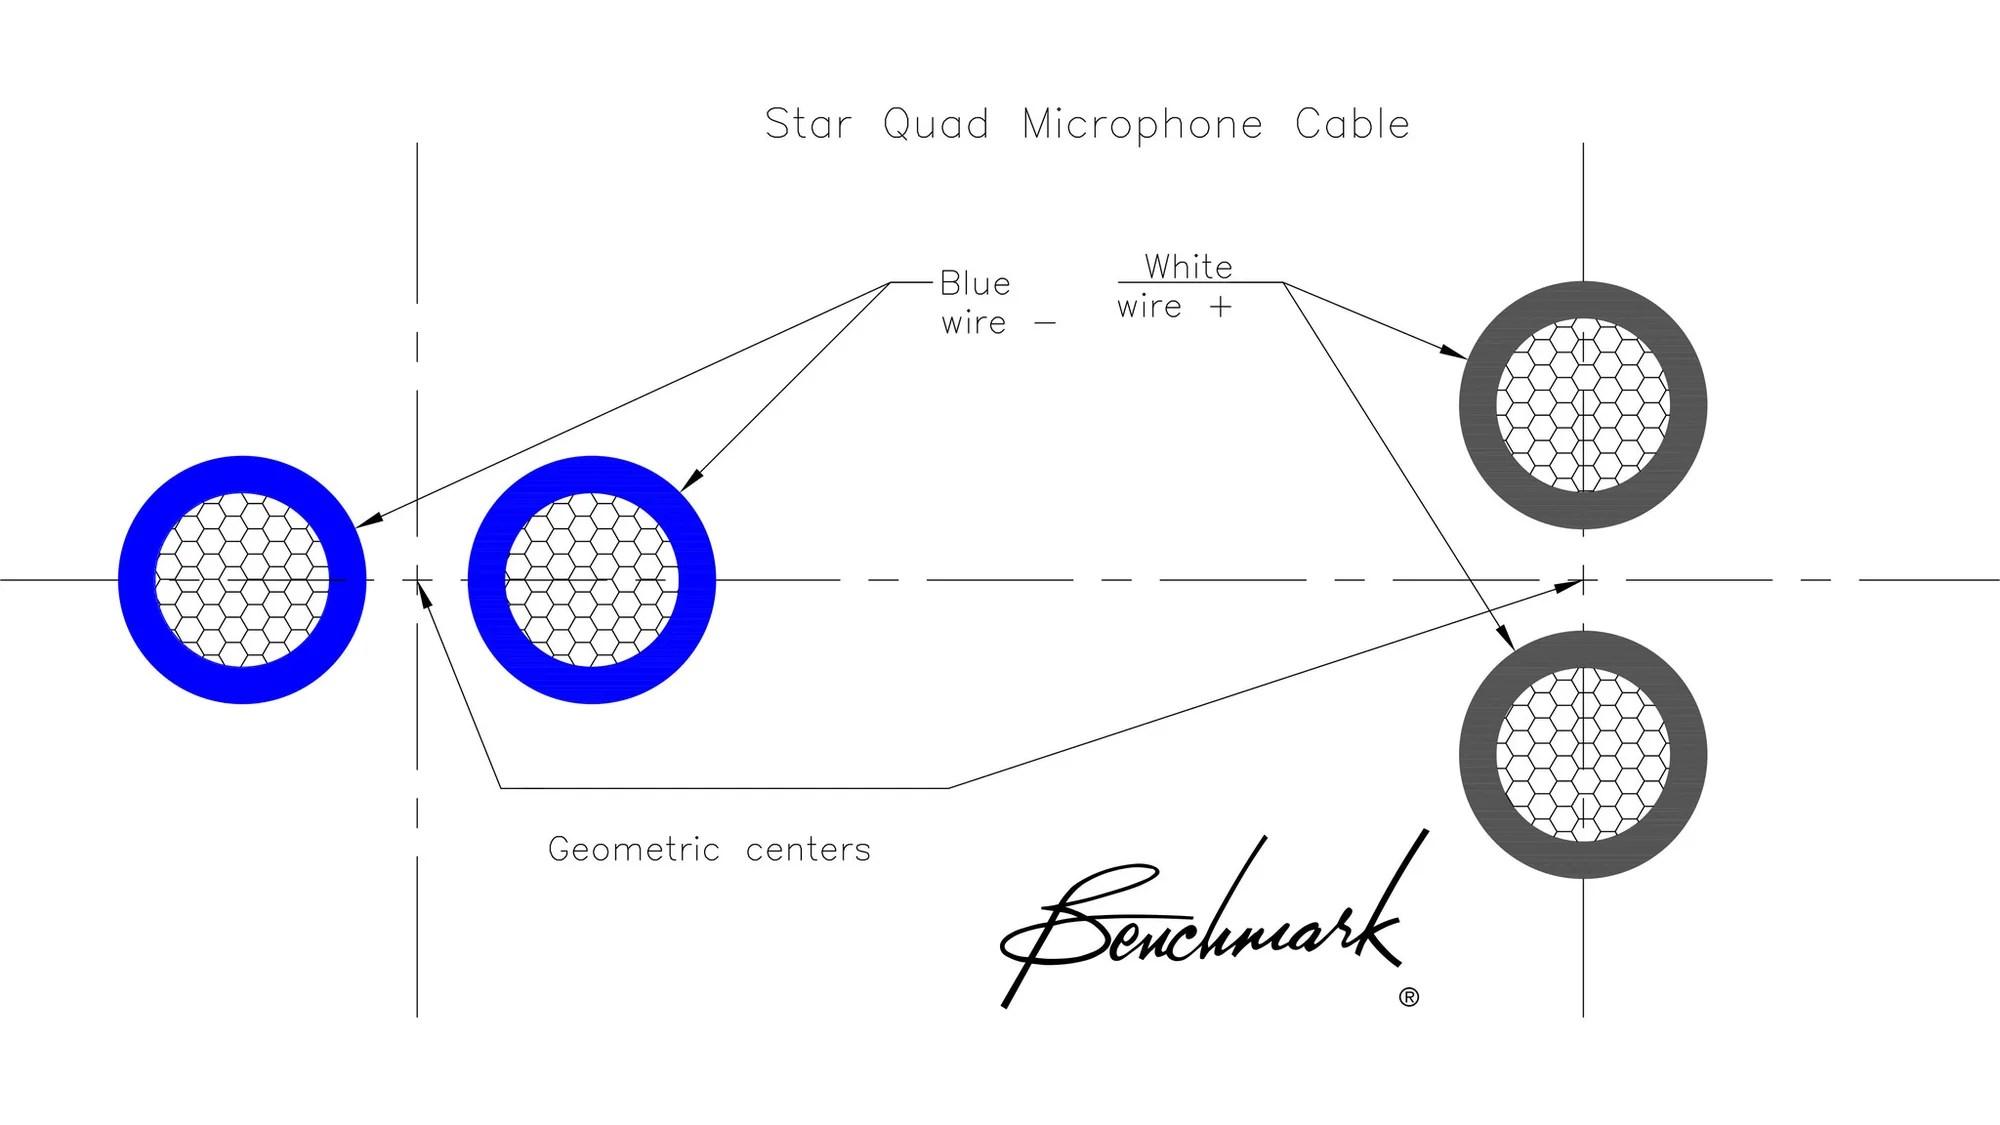 benchmark studio stage starquad xlr cable for analog audio [ 2000 x 1125 Pixel ]